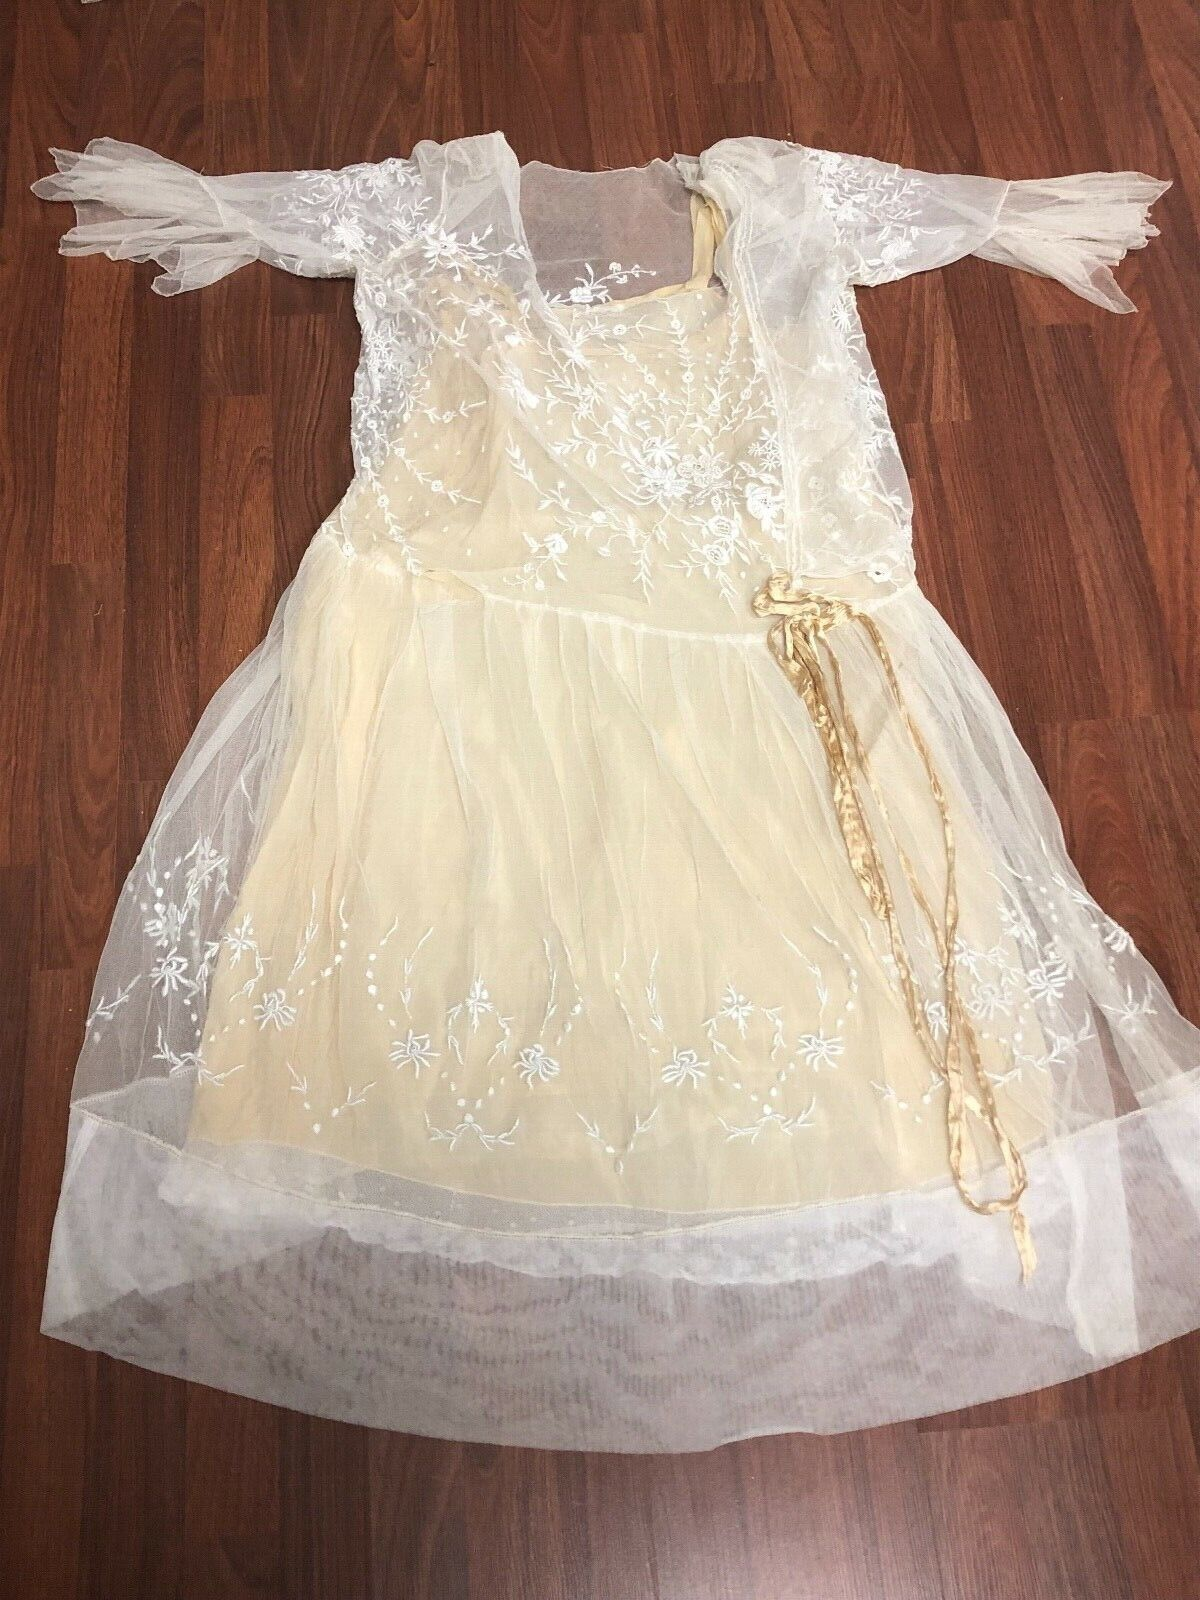 Antique Edwardian White Mesh Dress with Floral Em… - image 3